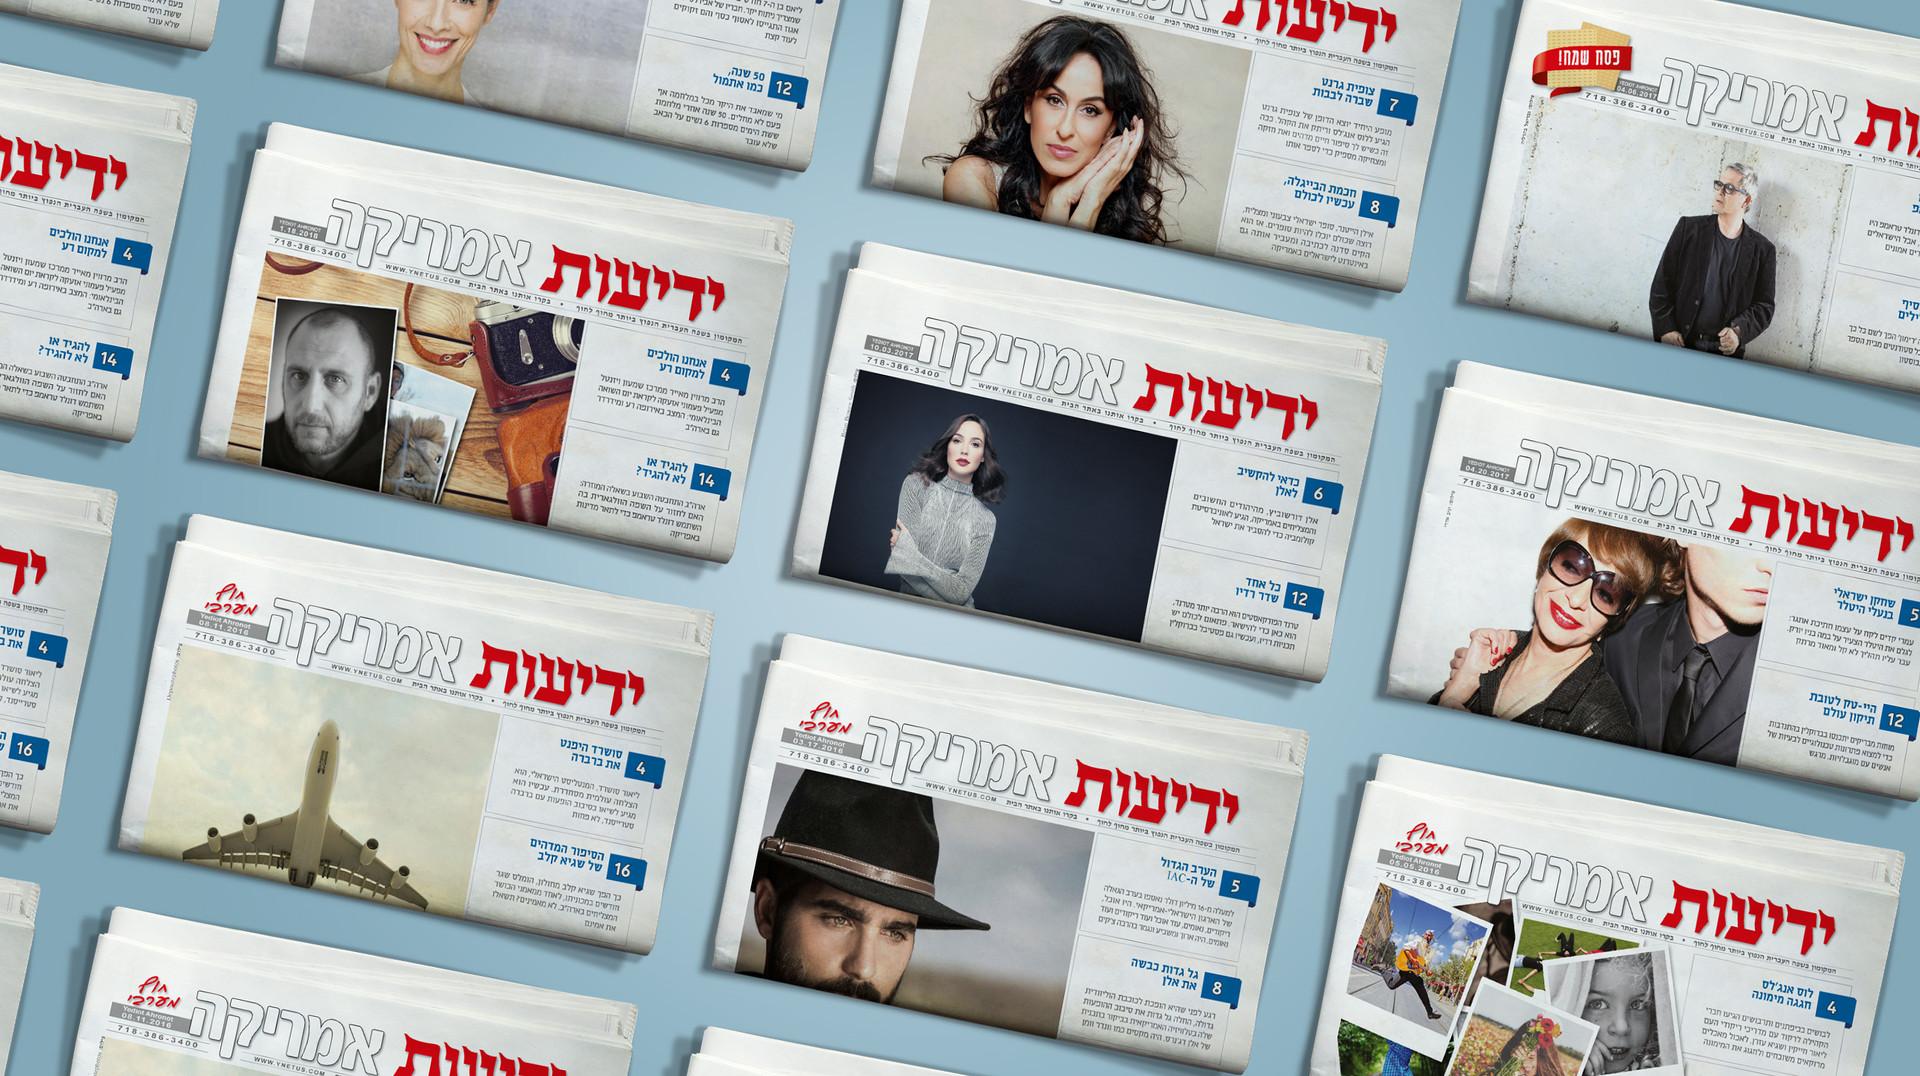 Yediot Aharonot newspaper